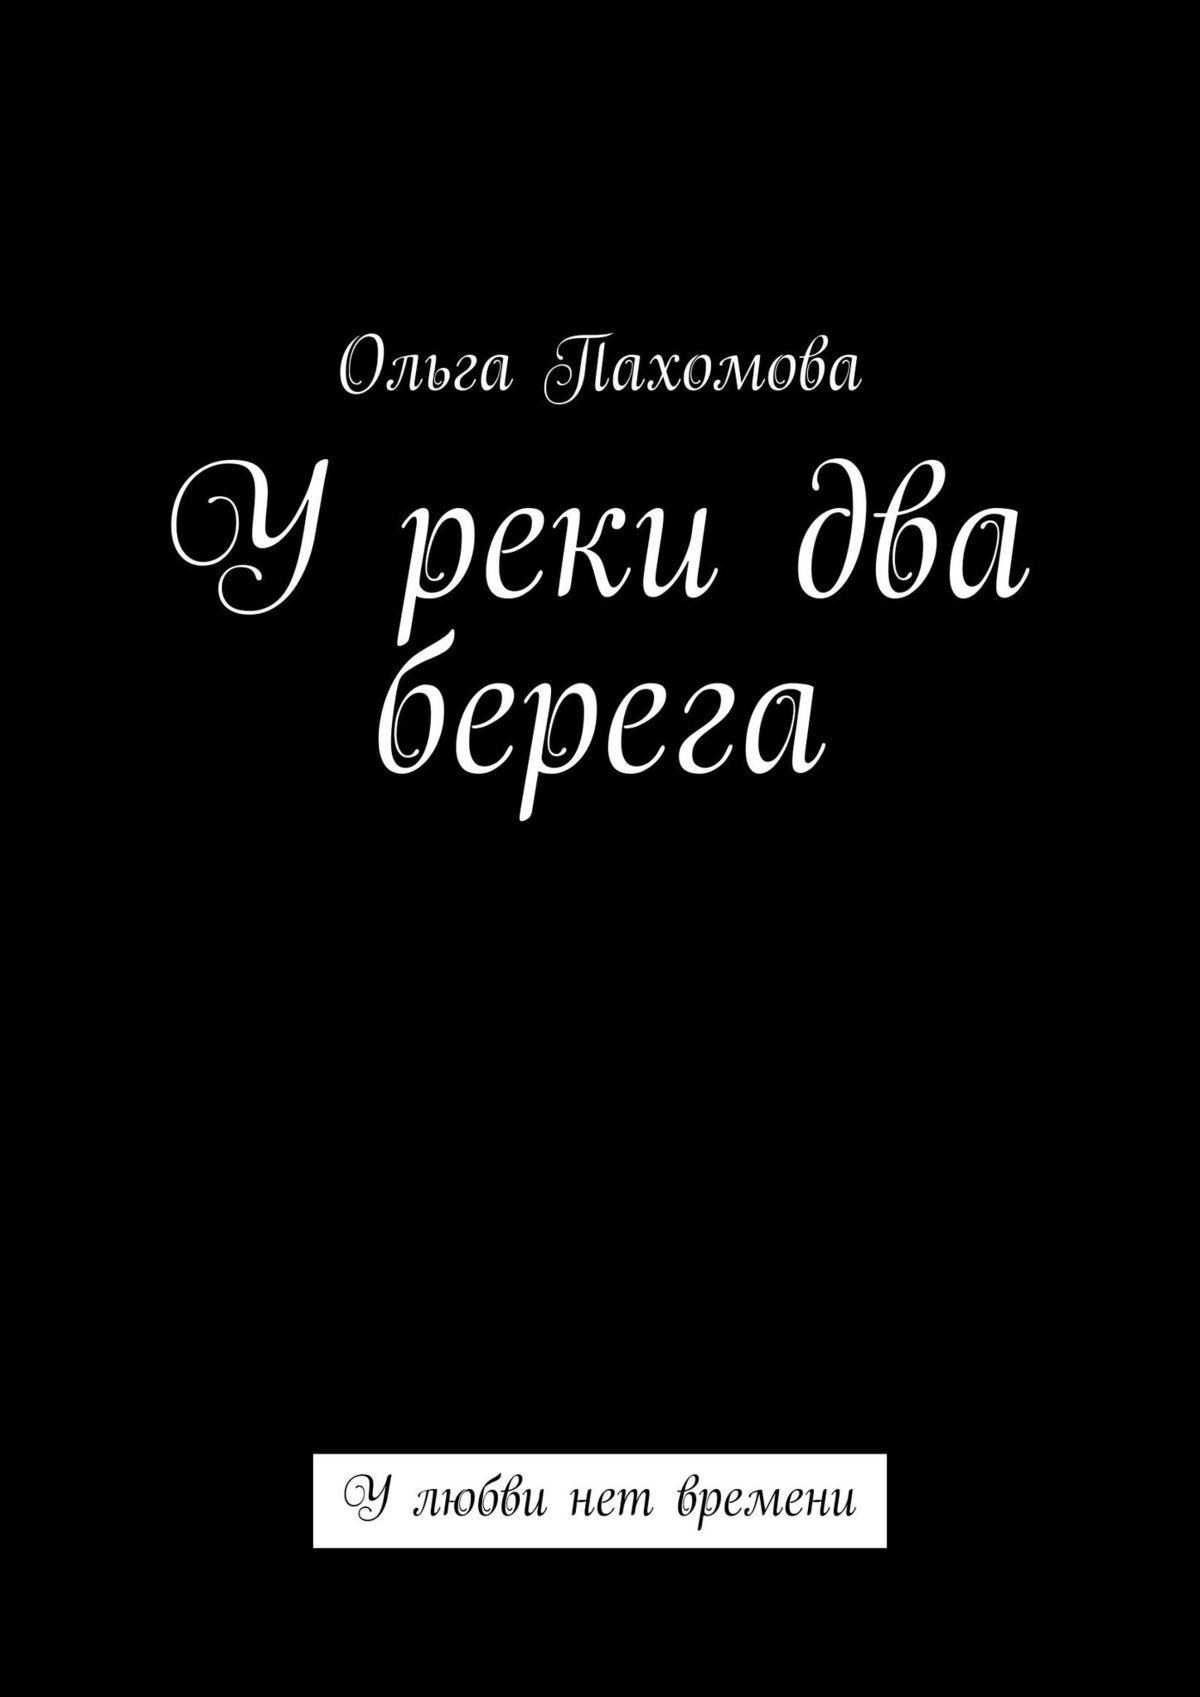 Ольга Ивановна Пахомова Уреки два берега. Улюбви нет времени